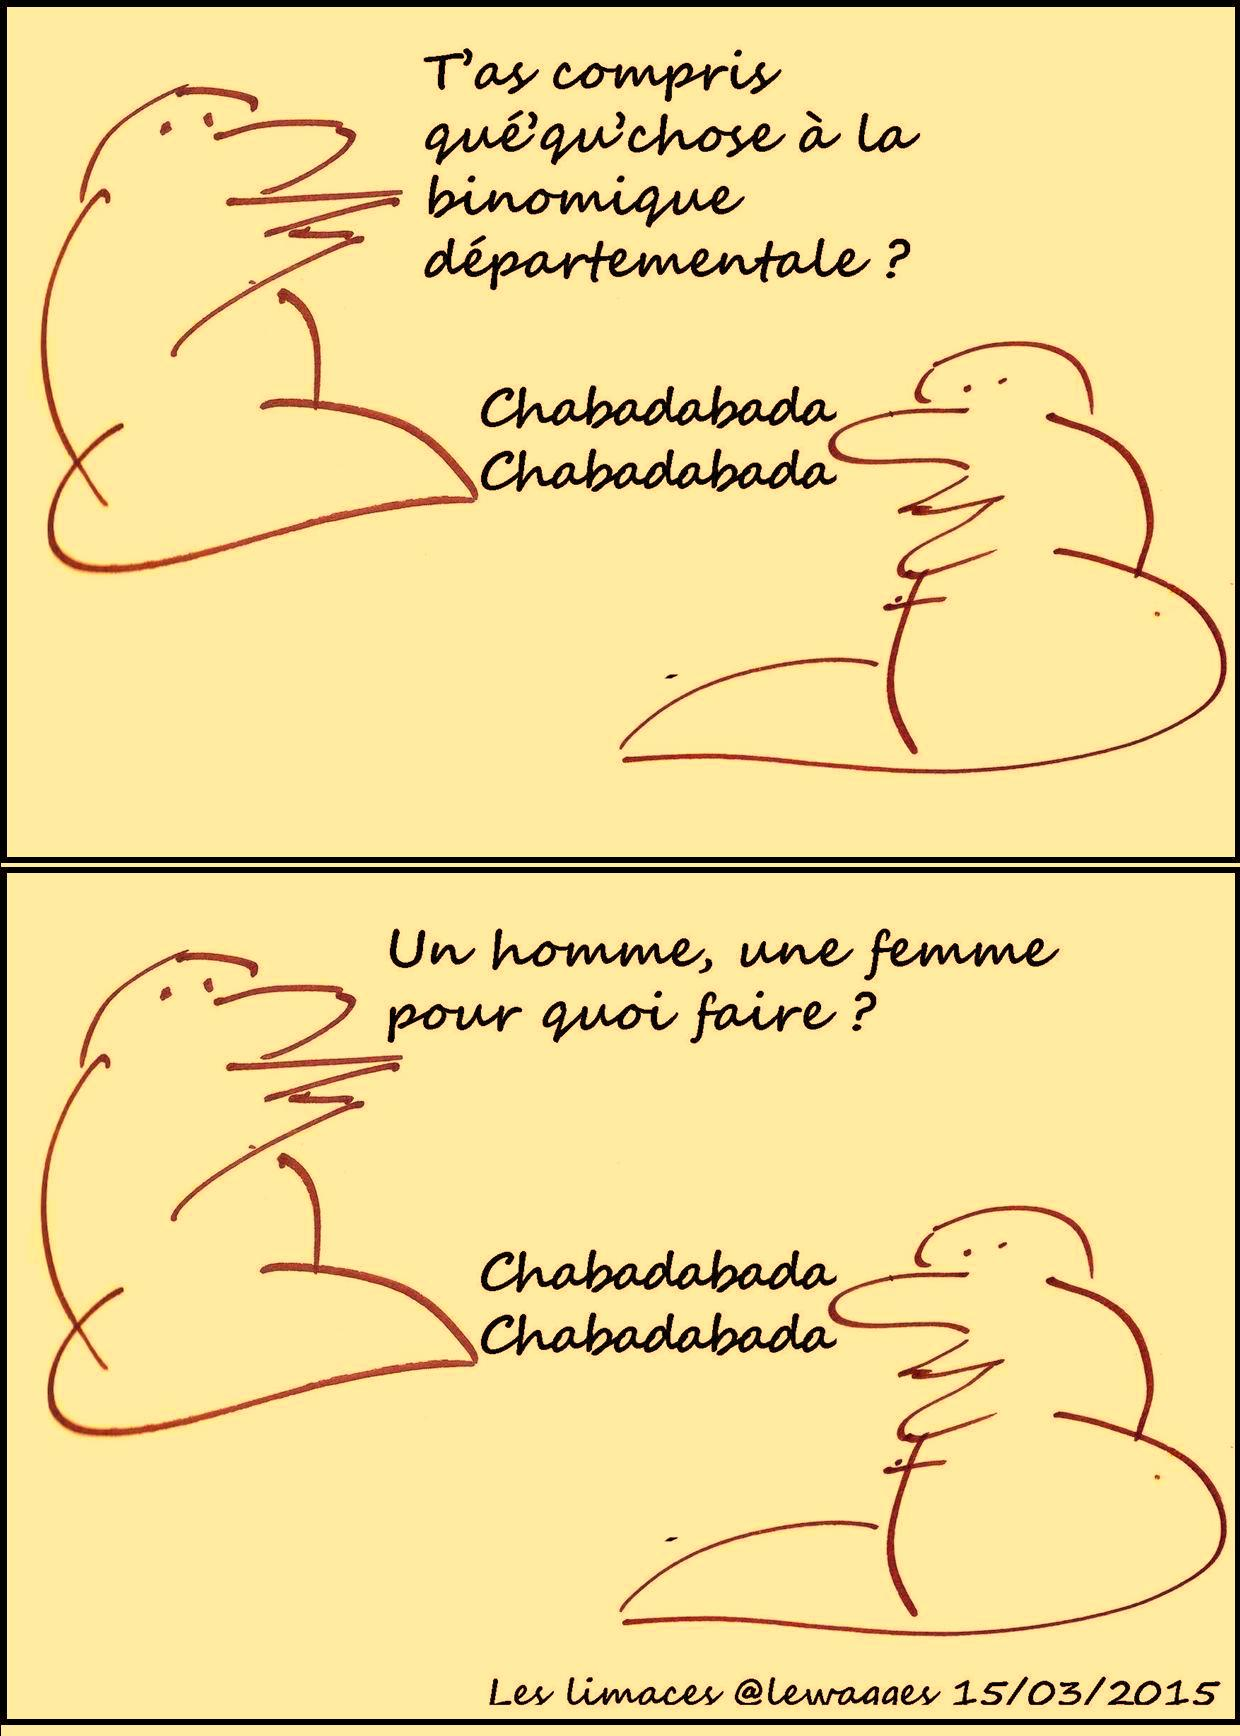 Chabadabada